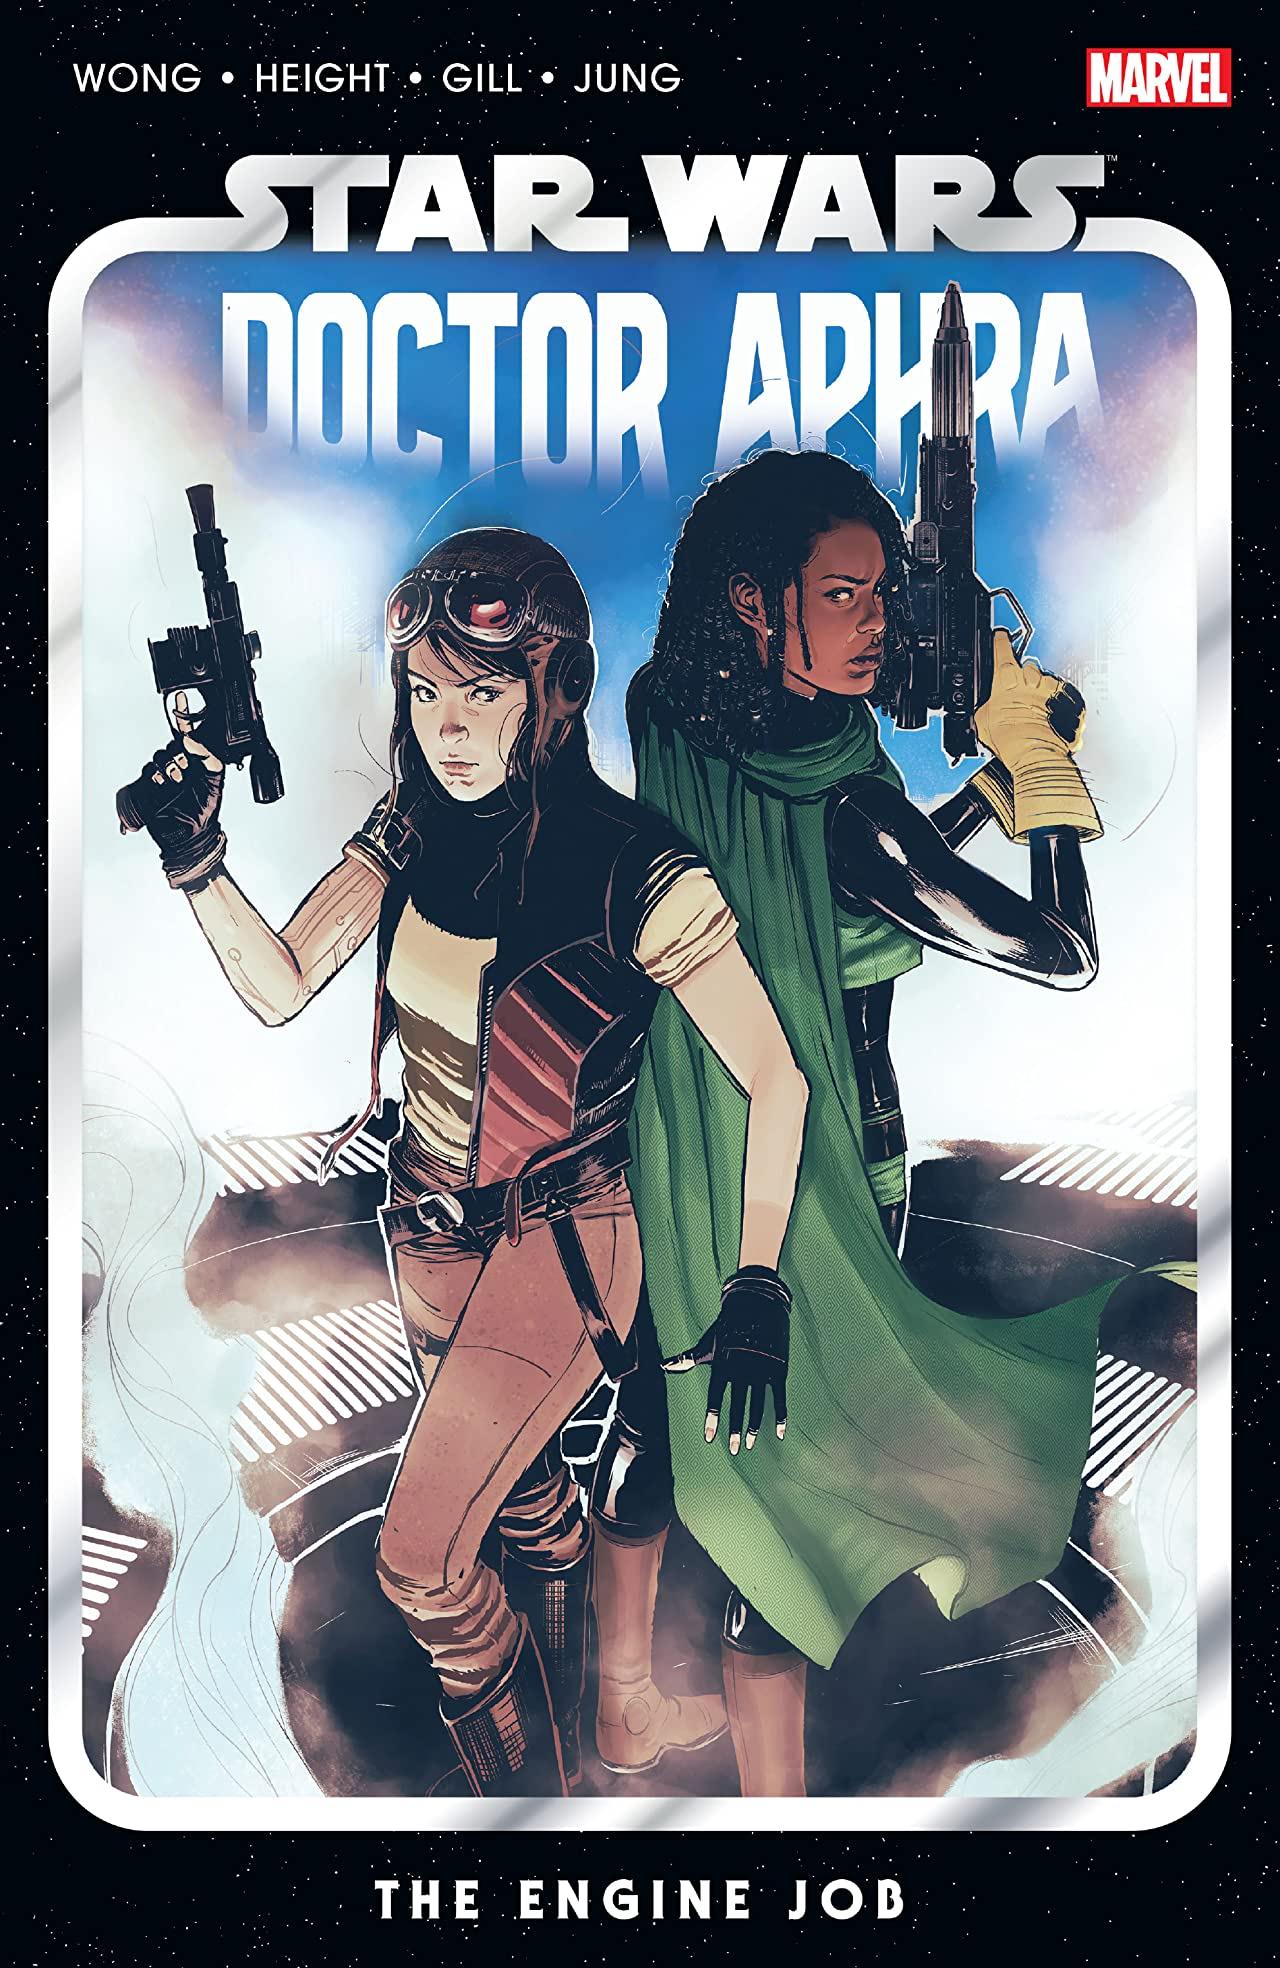 Star Wars: Doctor Aphra Vol. 2 - The Engine Job (Trade Paperback)